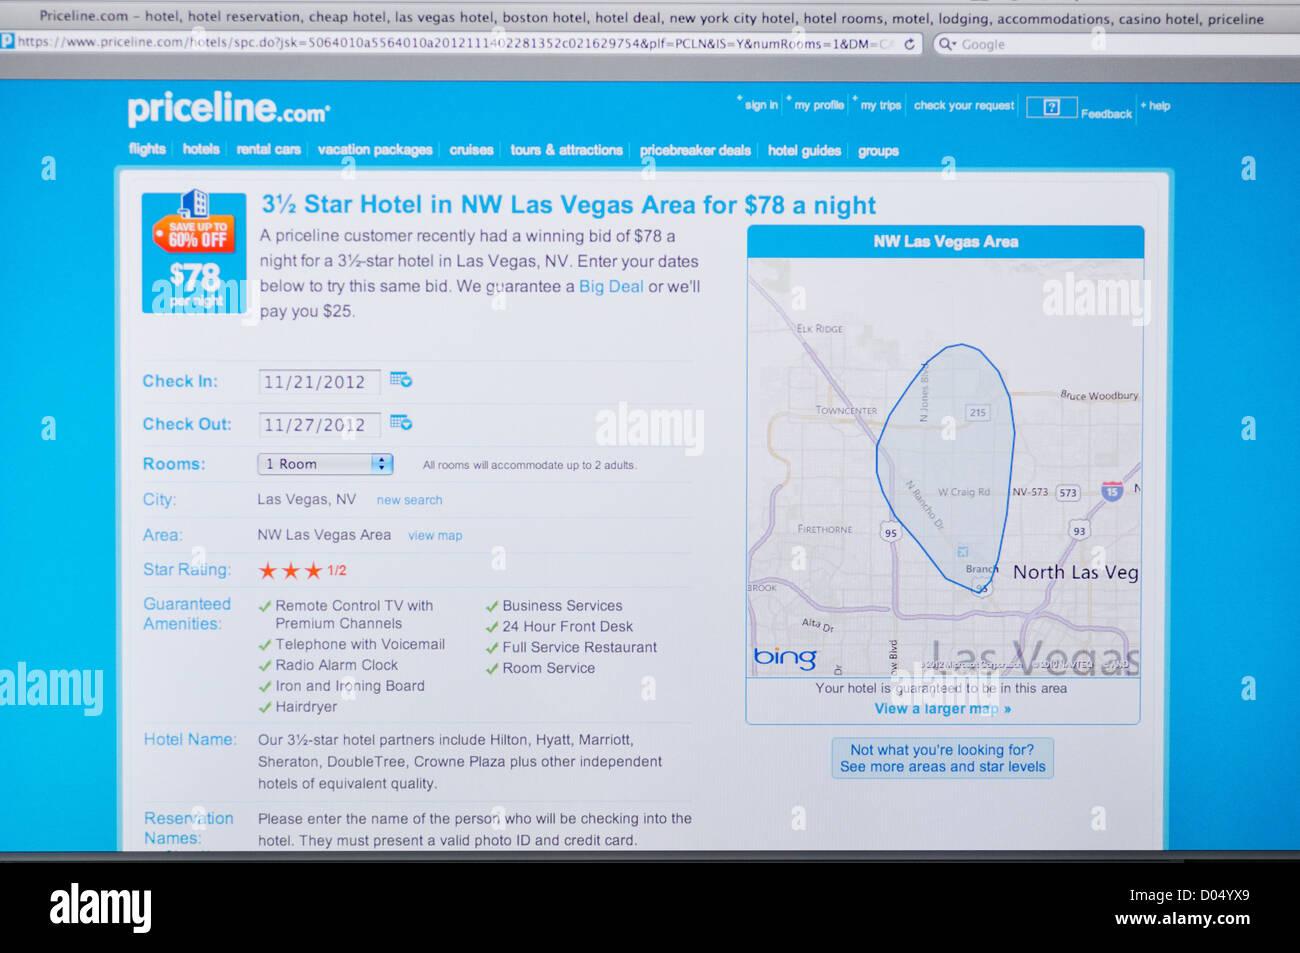 Priceline Com Website Deep Discounts On Travel Arrangements Stock Photo Alamy